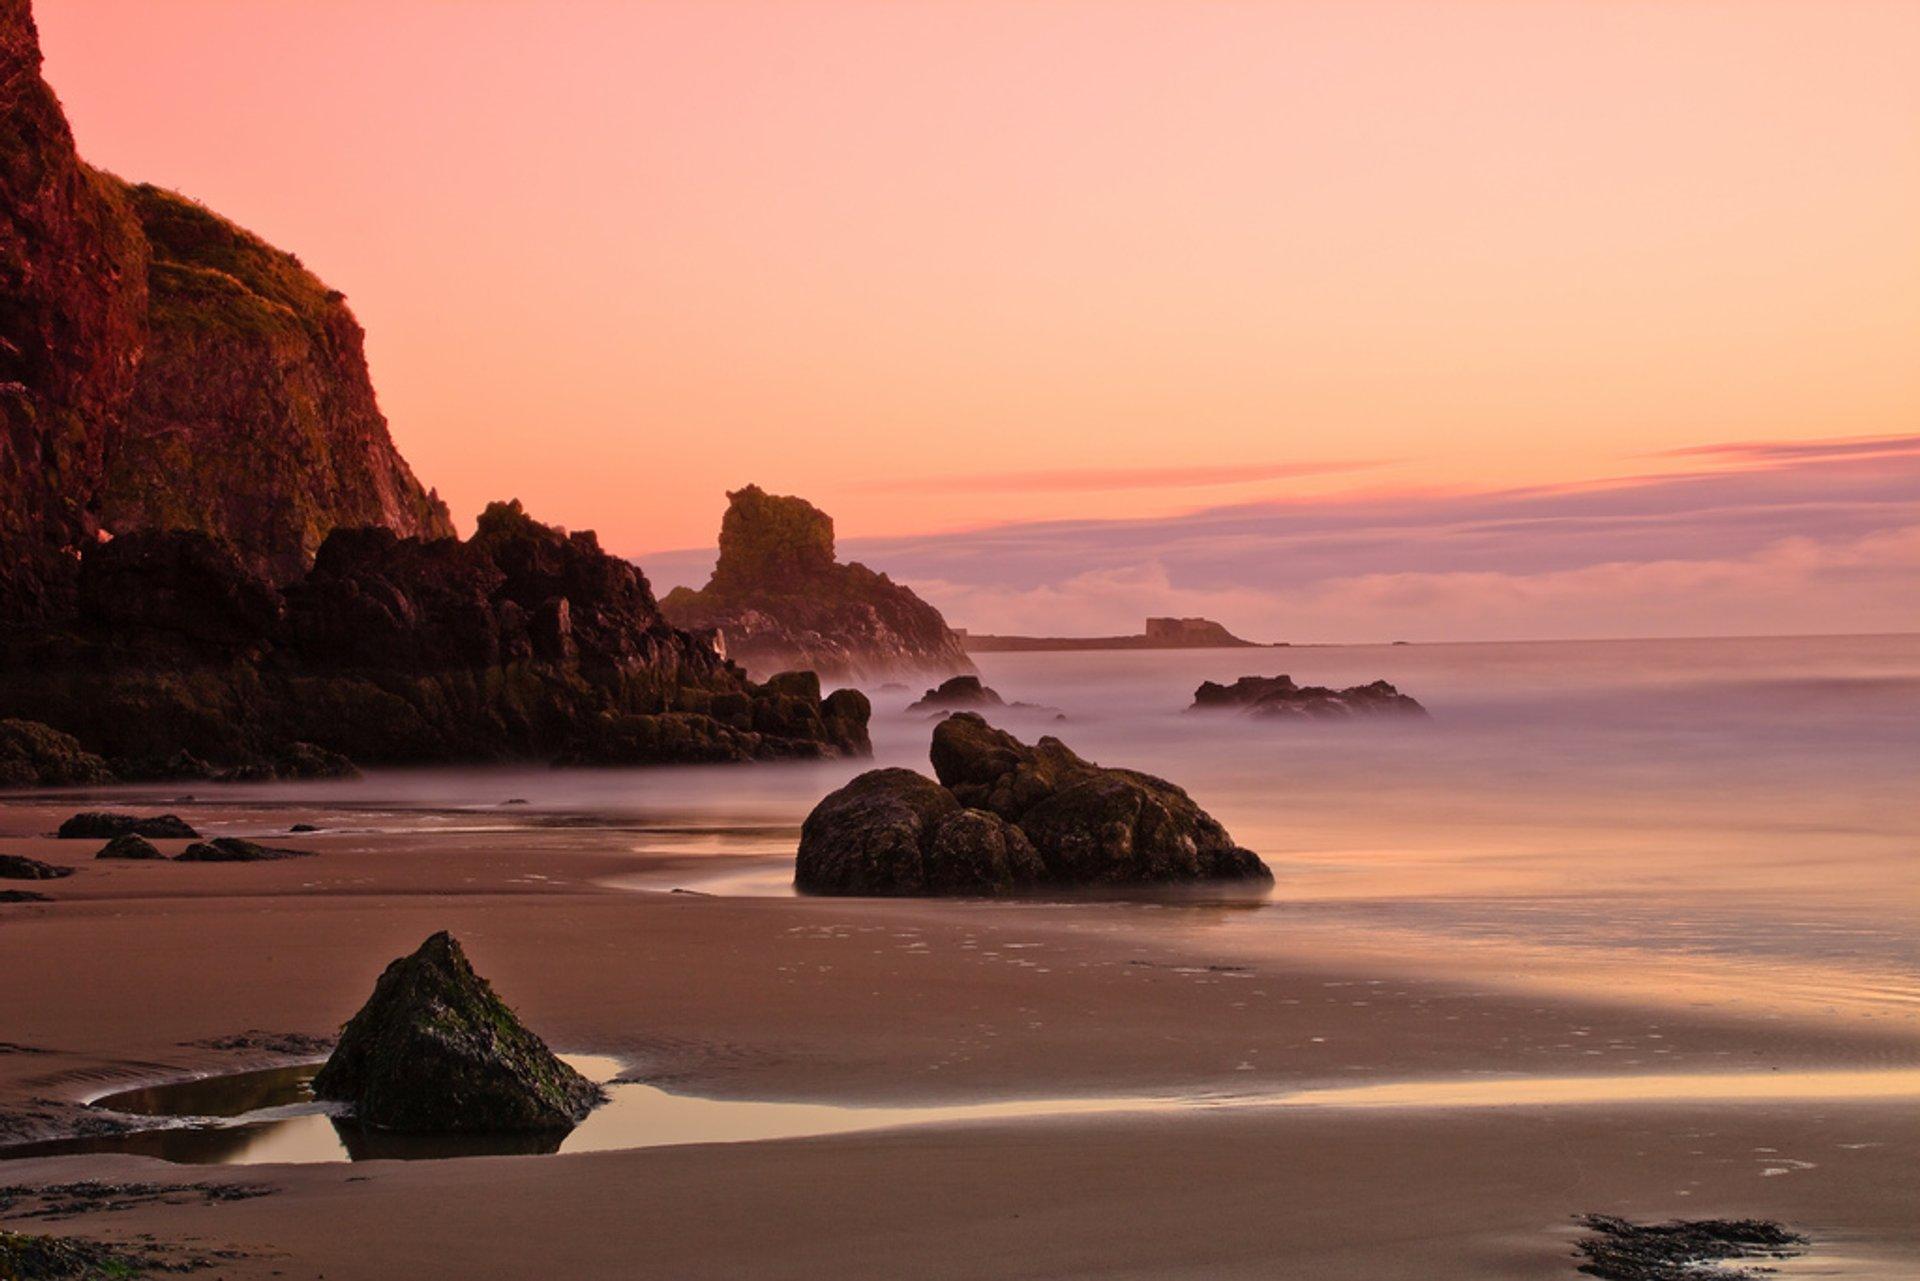 Lunan Bay Bathing Season in Scotland 2020 - Best Time